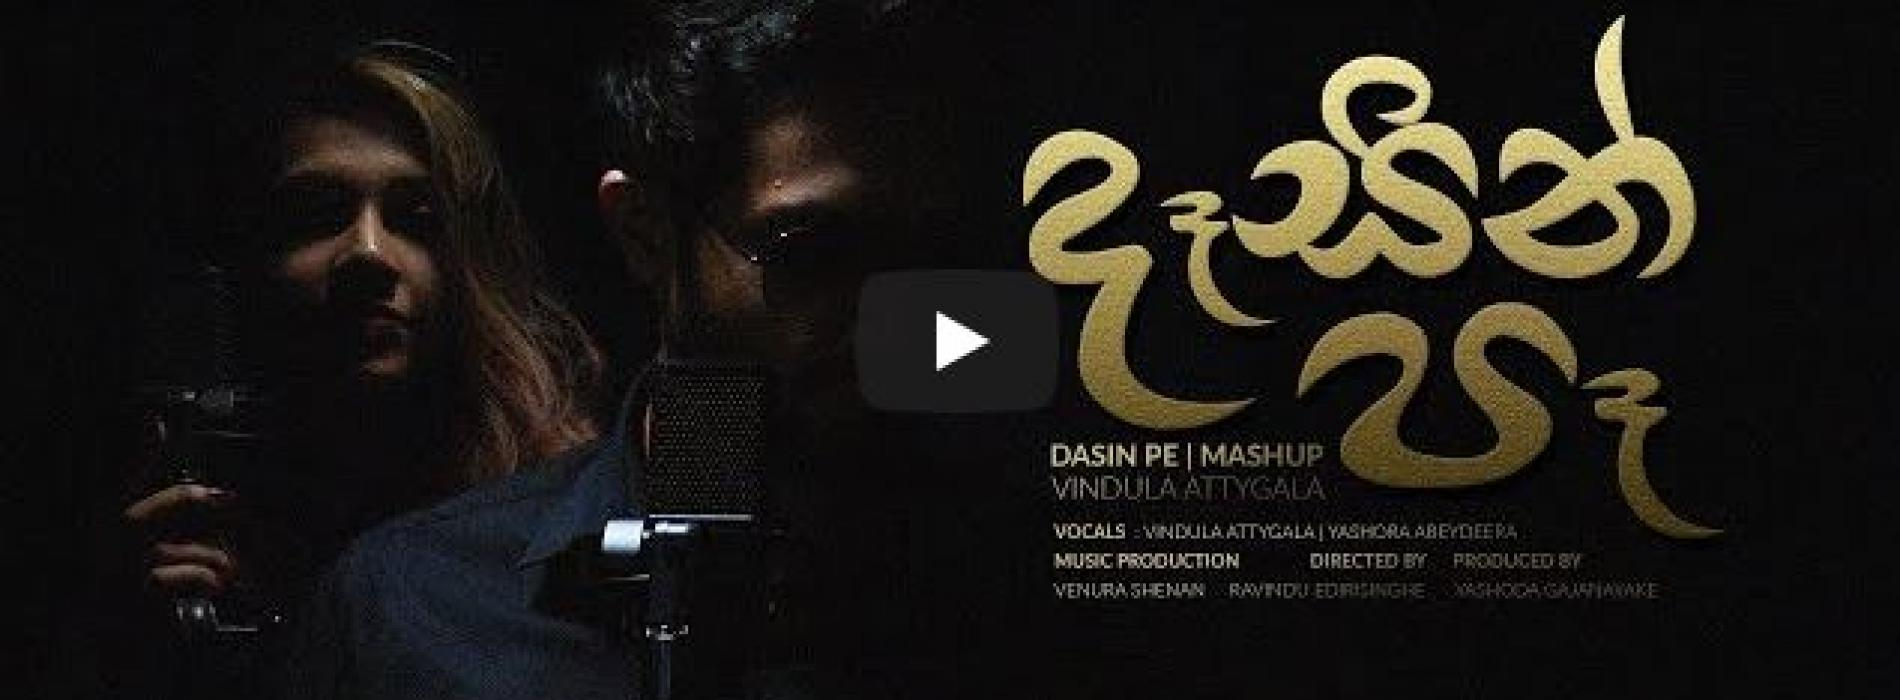 New Music : දෑසින් පෑ – Dasin Pe | Mashup | Vindula Attygala ft Yashora Abeydeera